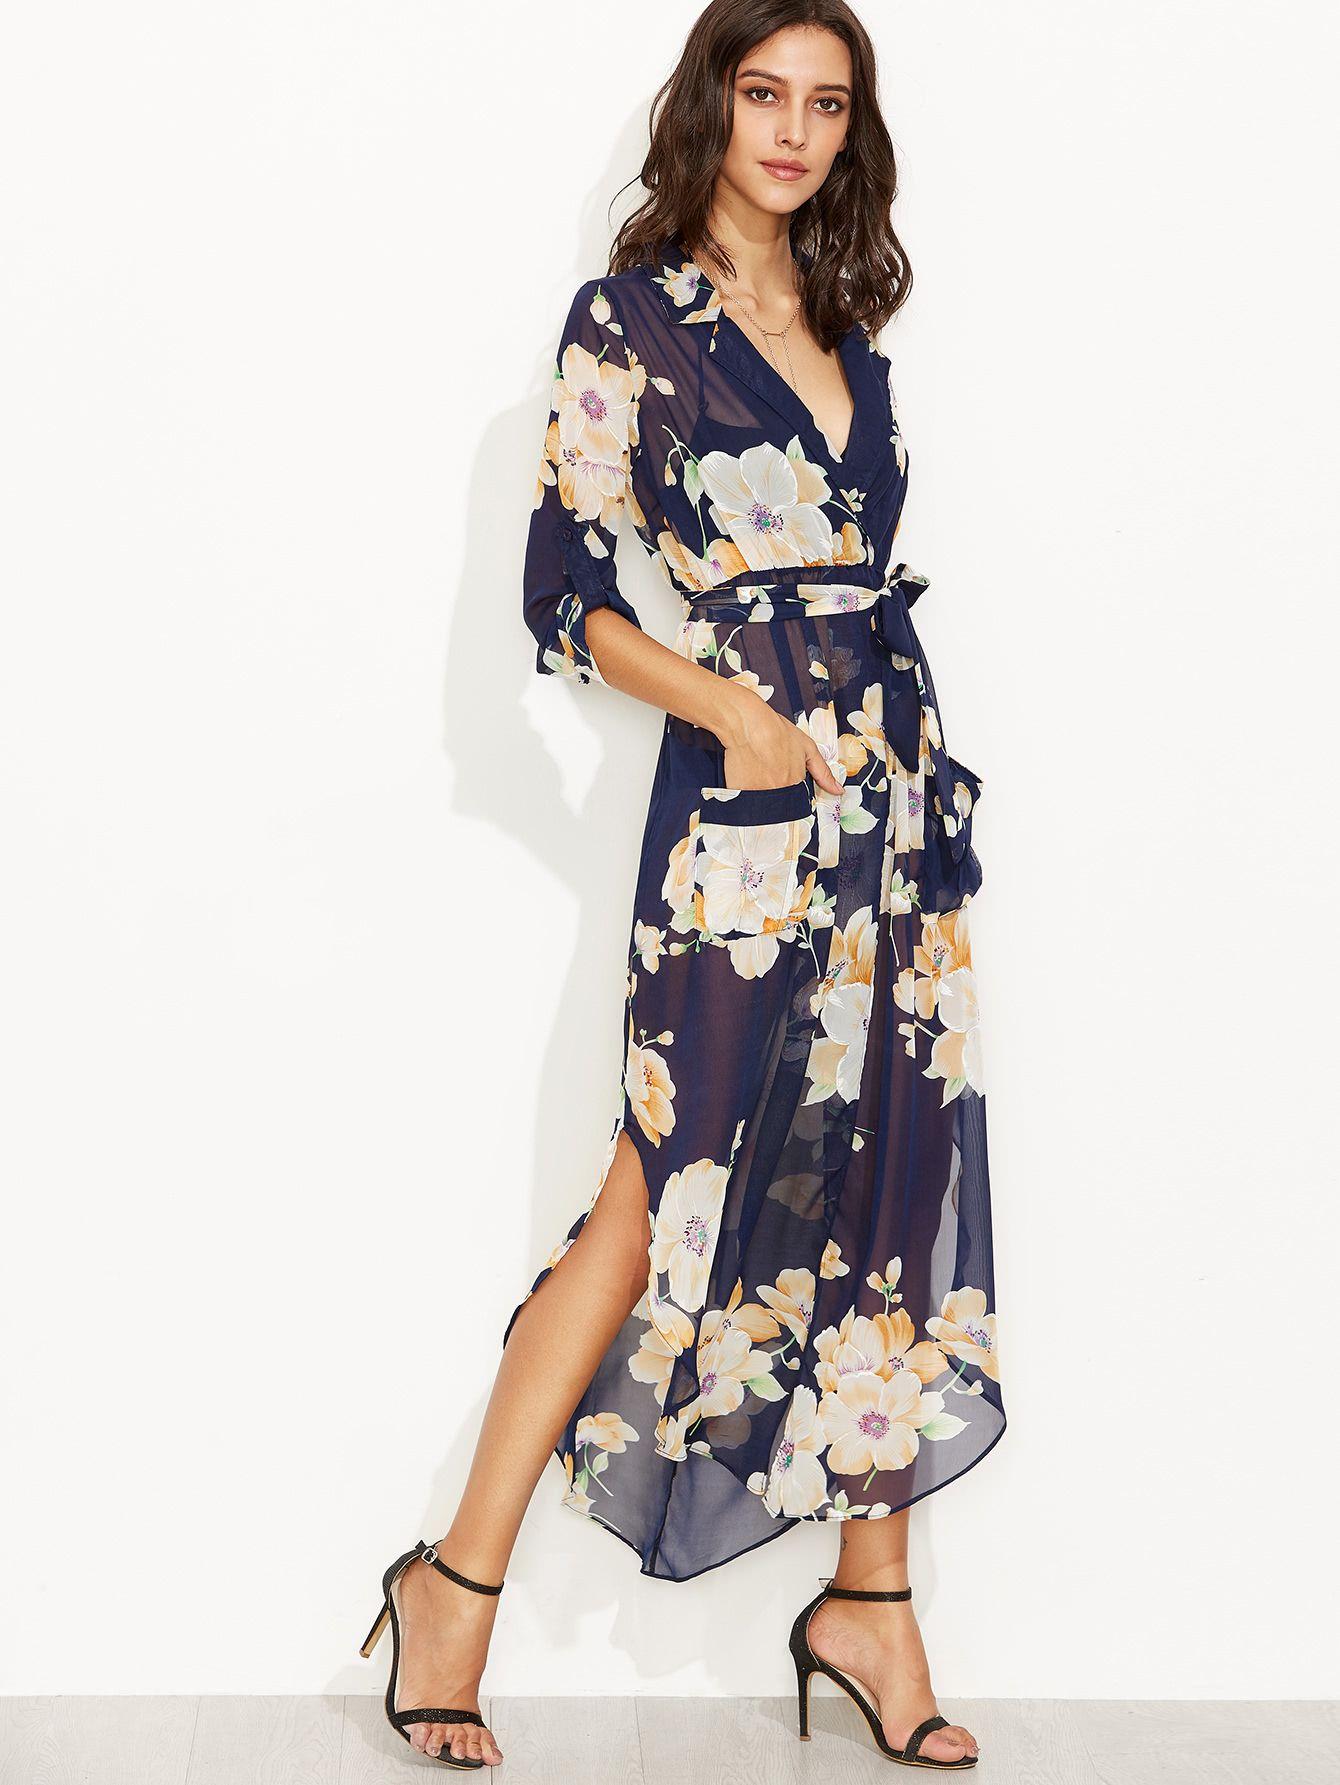 a4261f9a775f Shop Floral Print Self Tie Surplice Wrap Sheer Dress online | barato ...